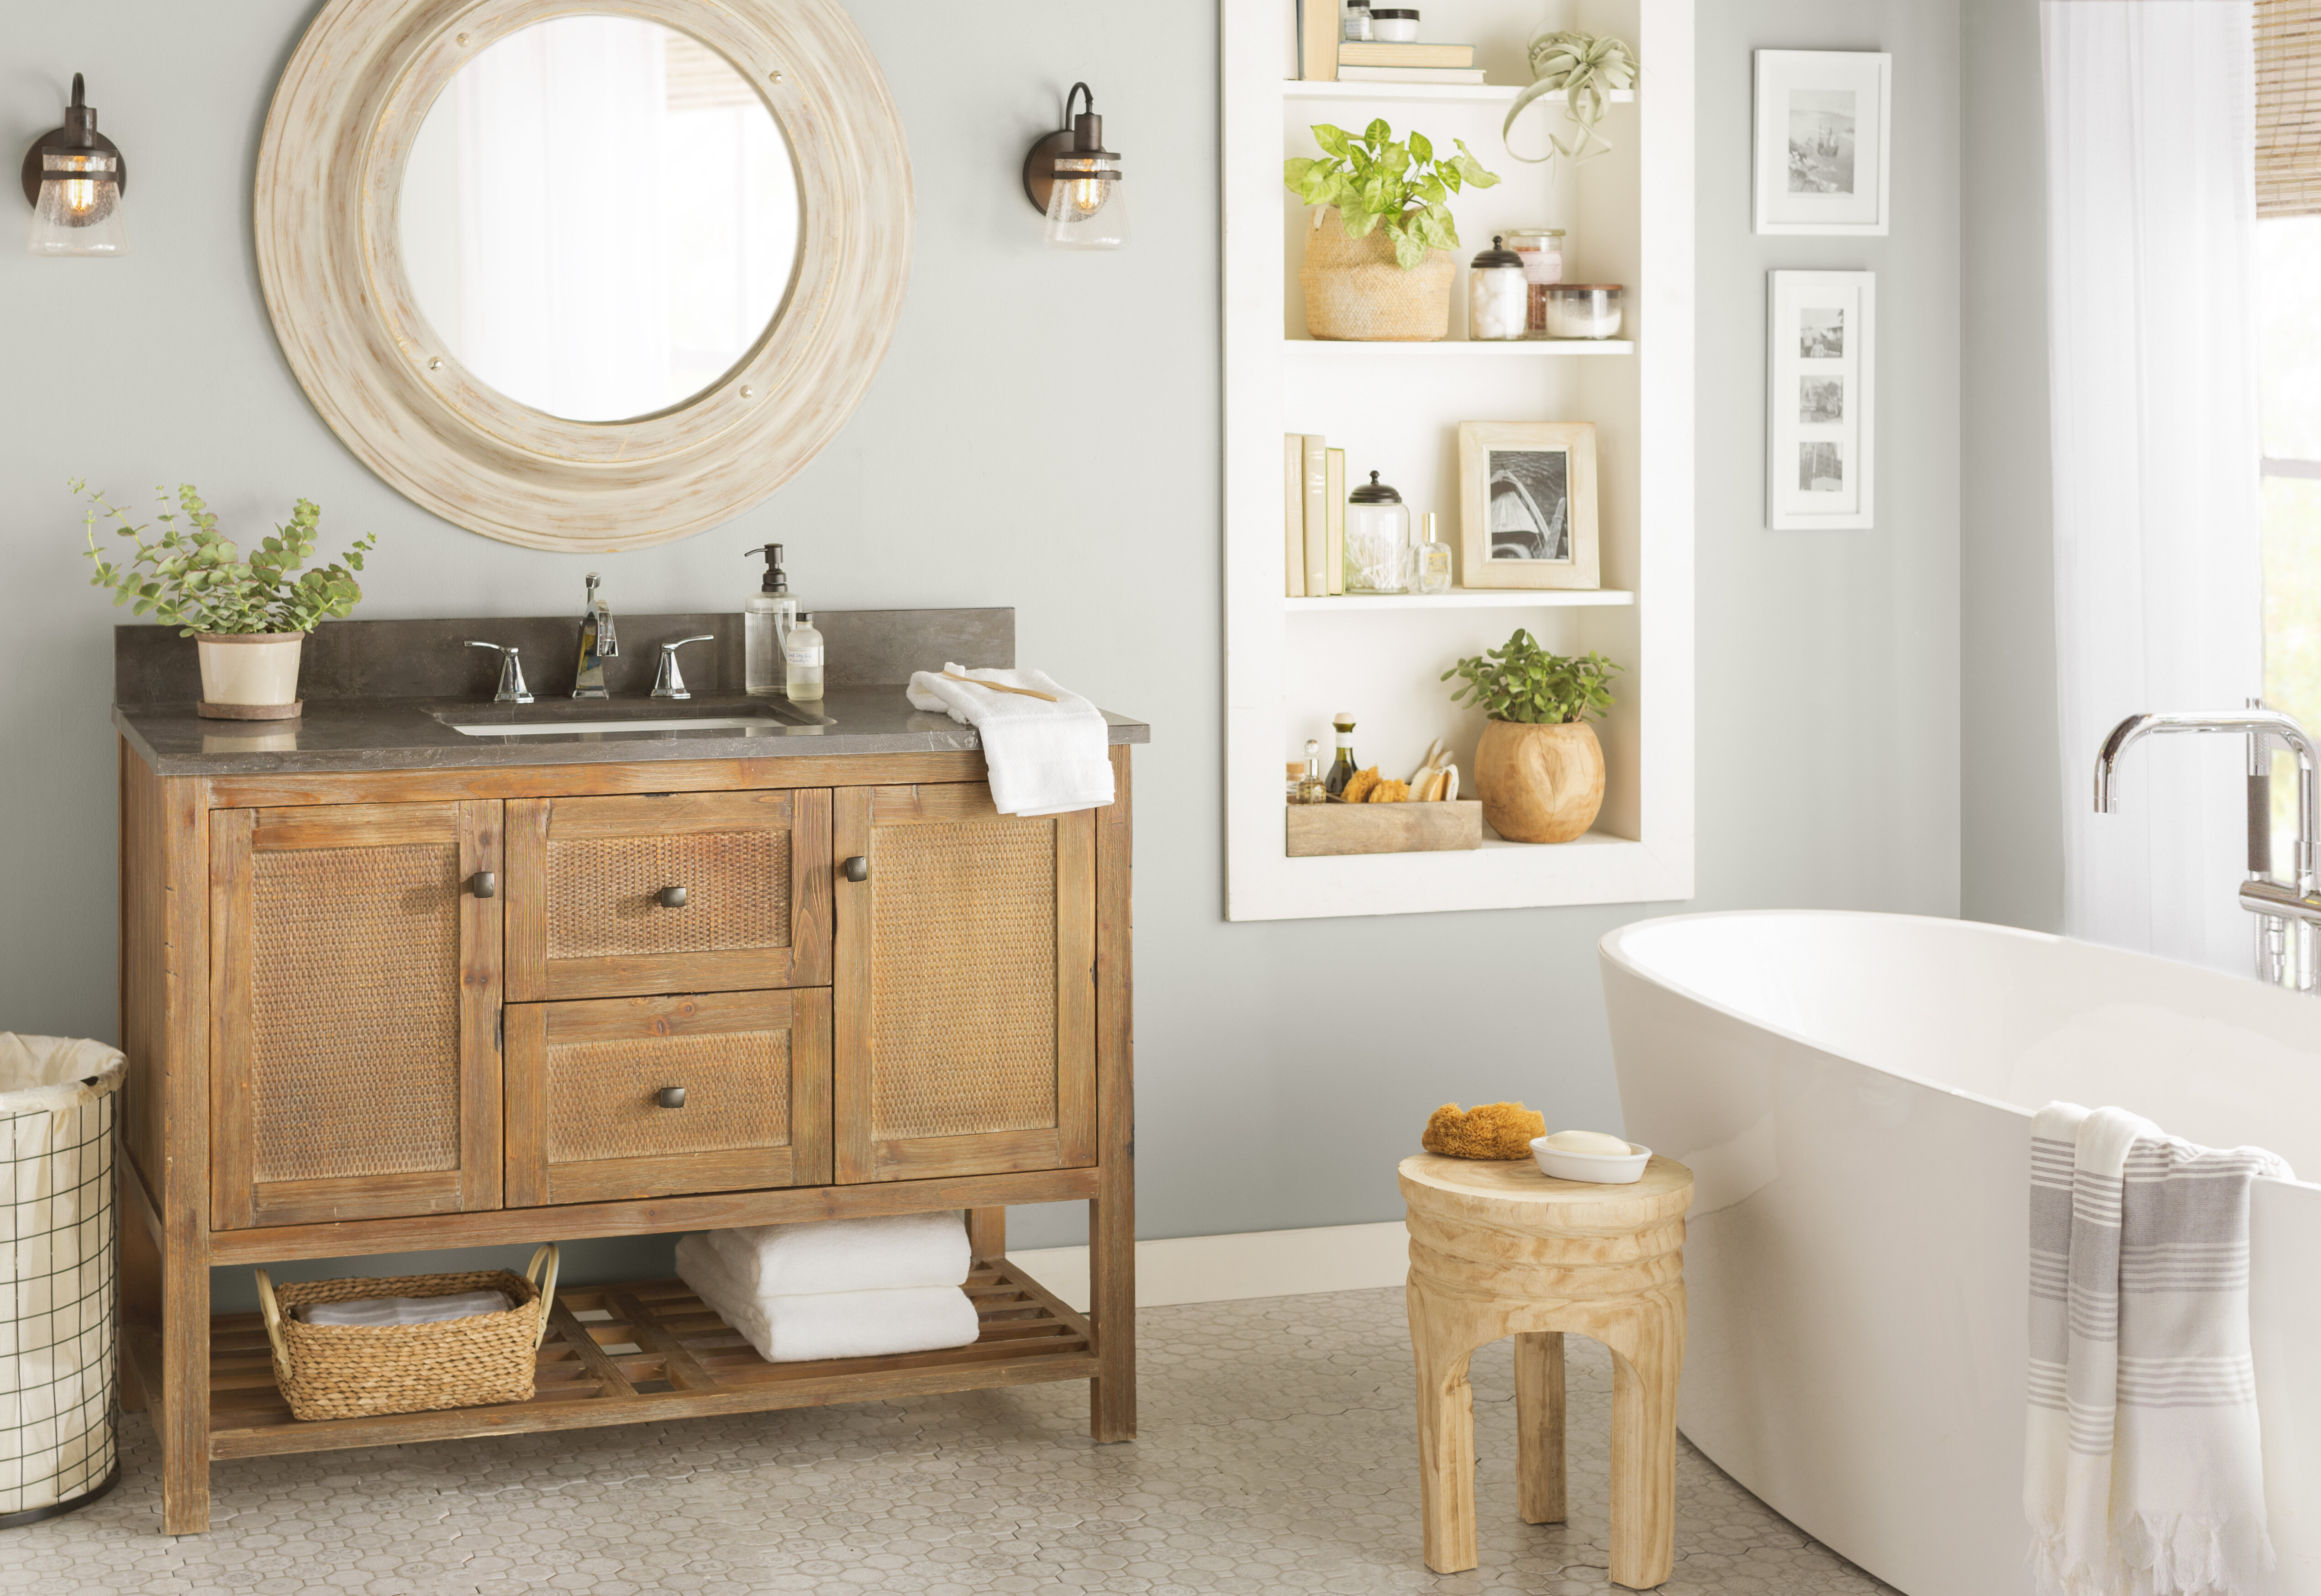 33 Beautiful Bathroom Remodel Ideas